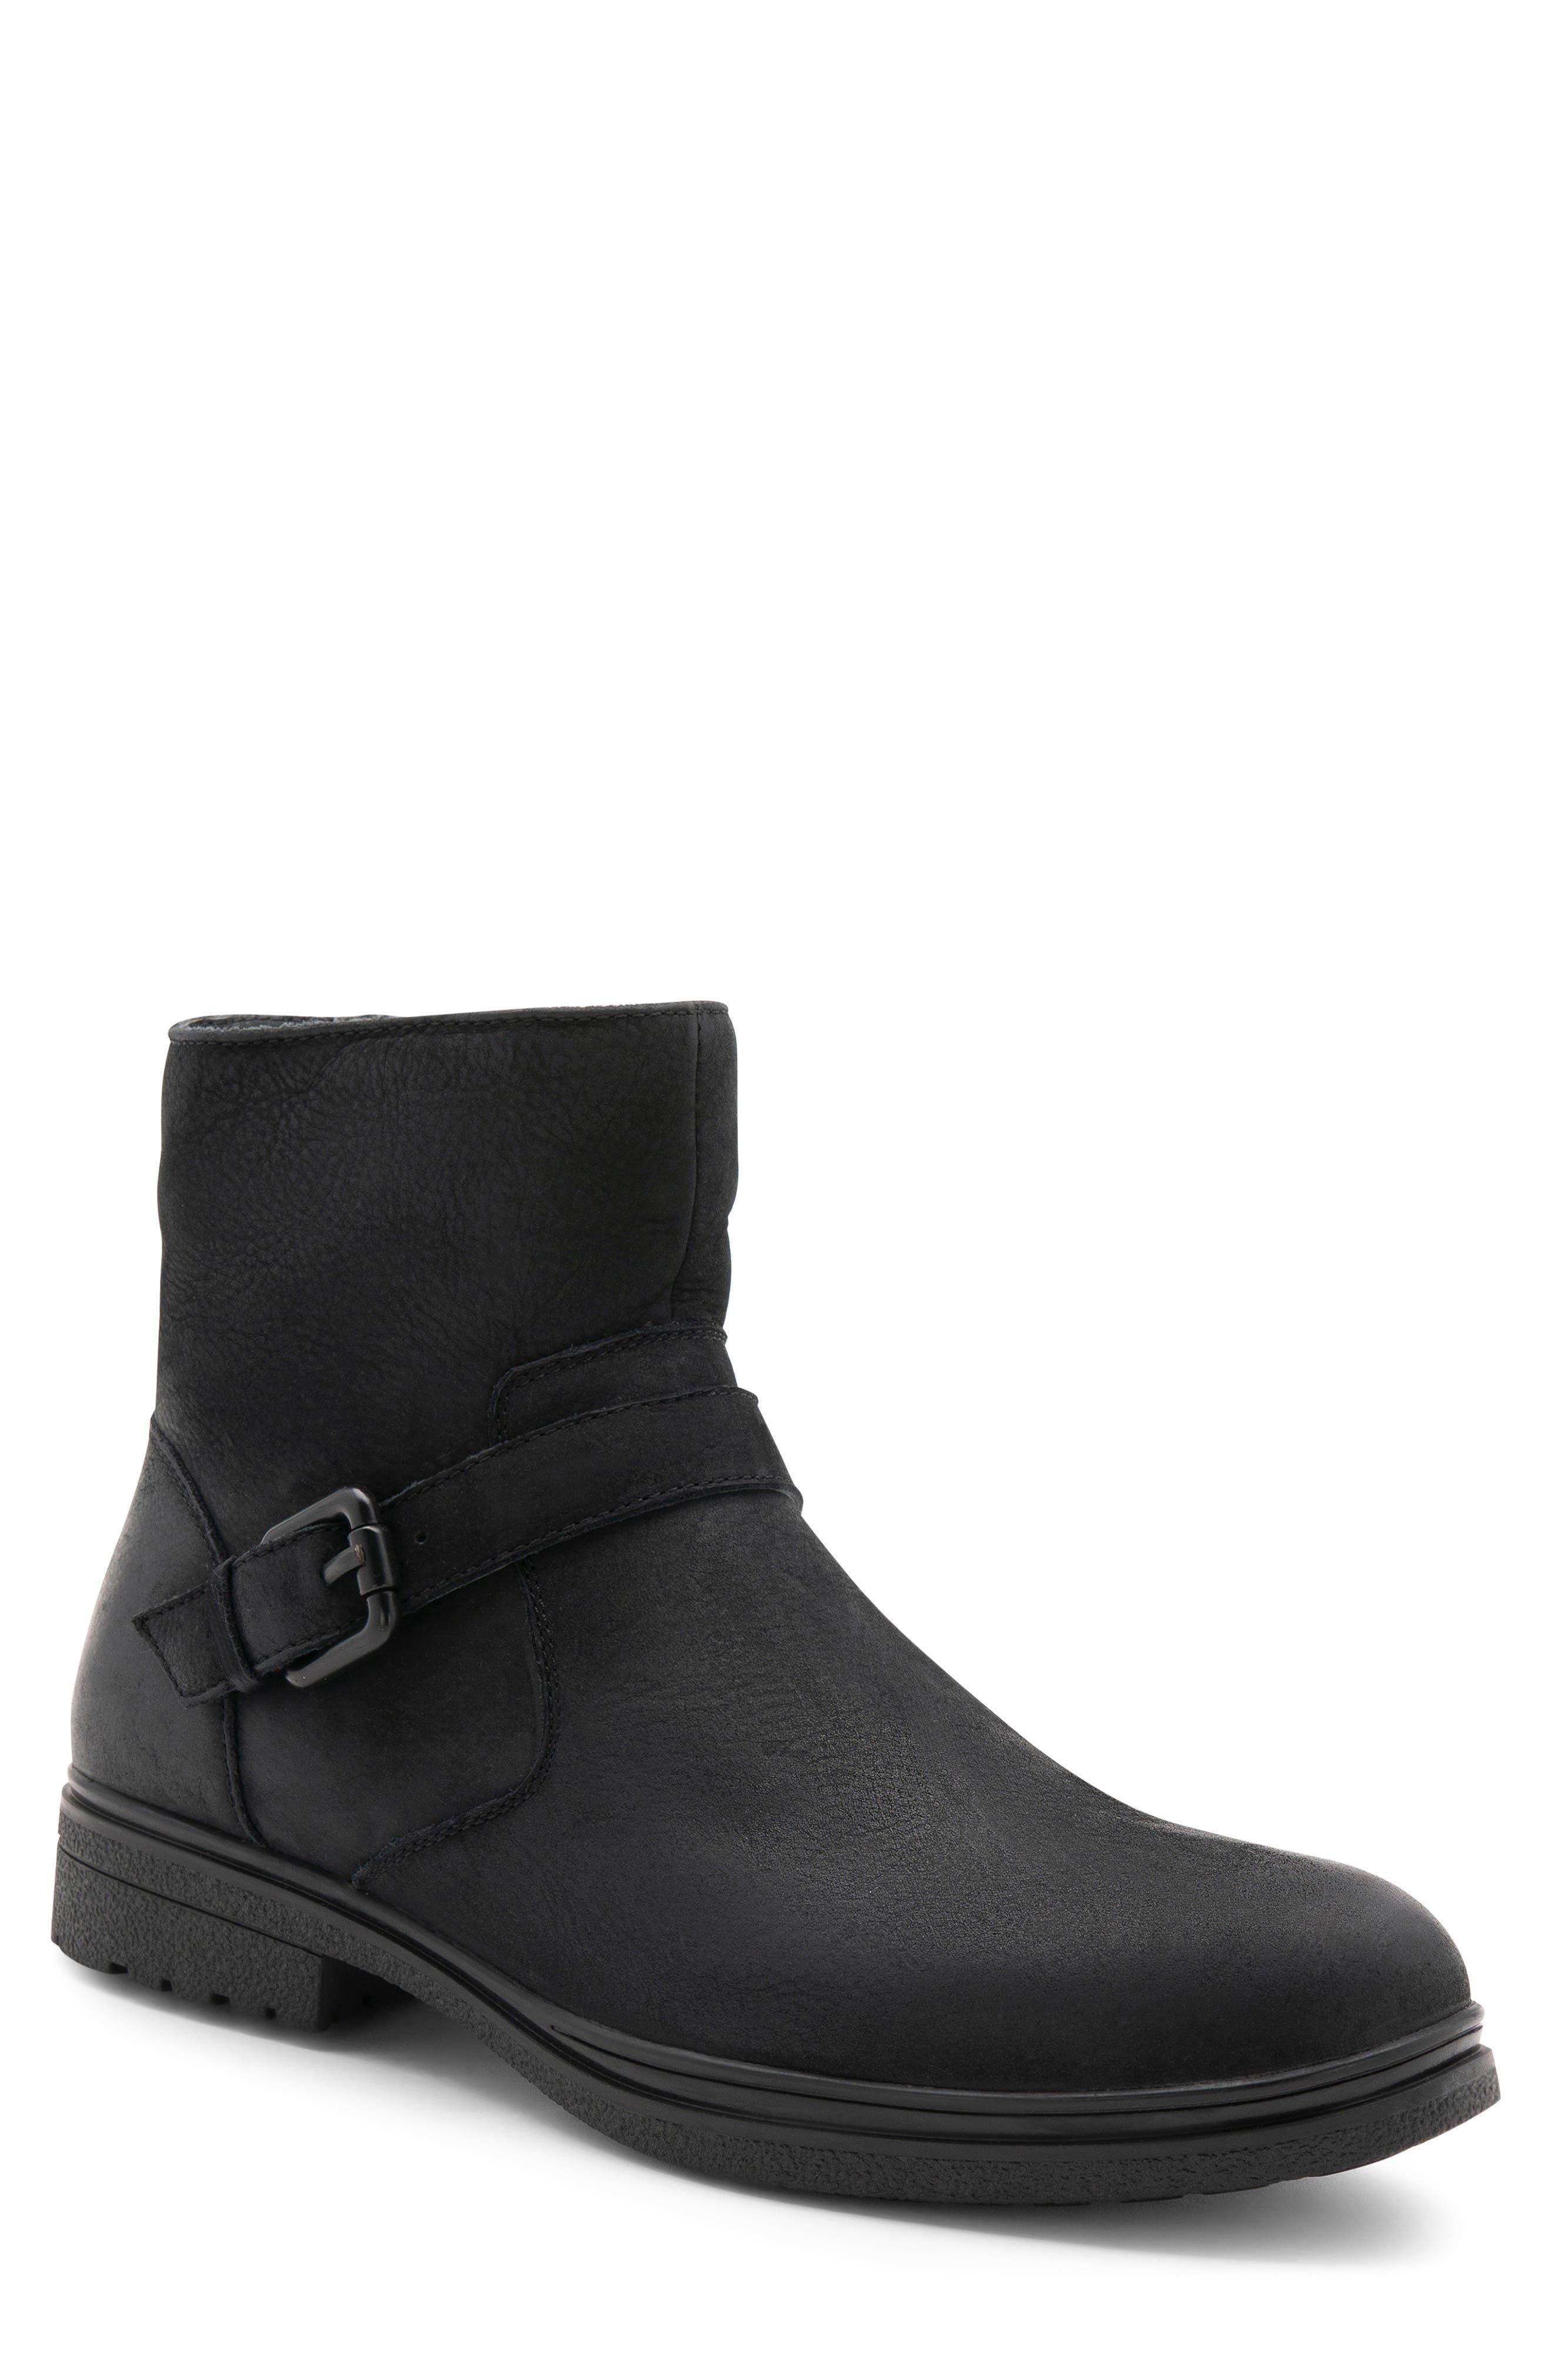 BLONDO Sylvester Waterproof Buckle Boot, Main, color, BLACK NUBUCK